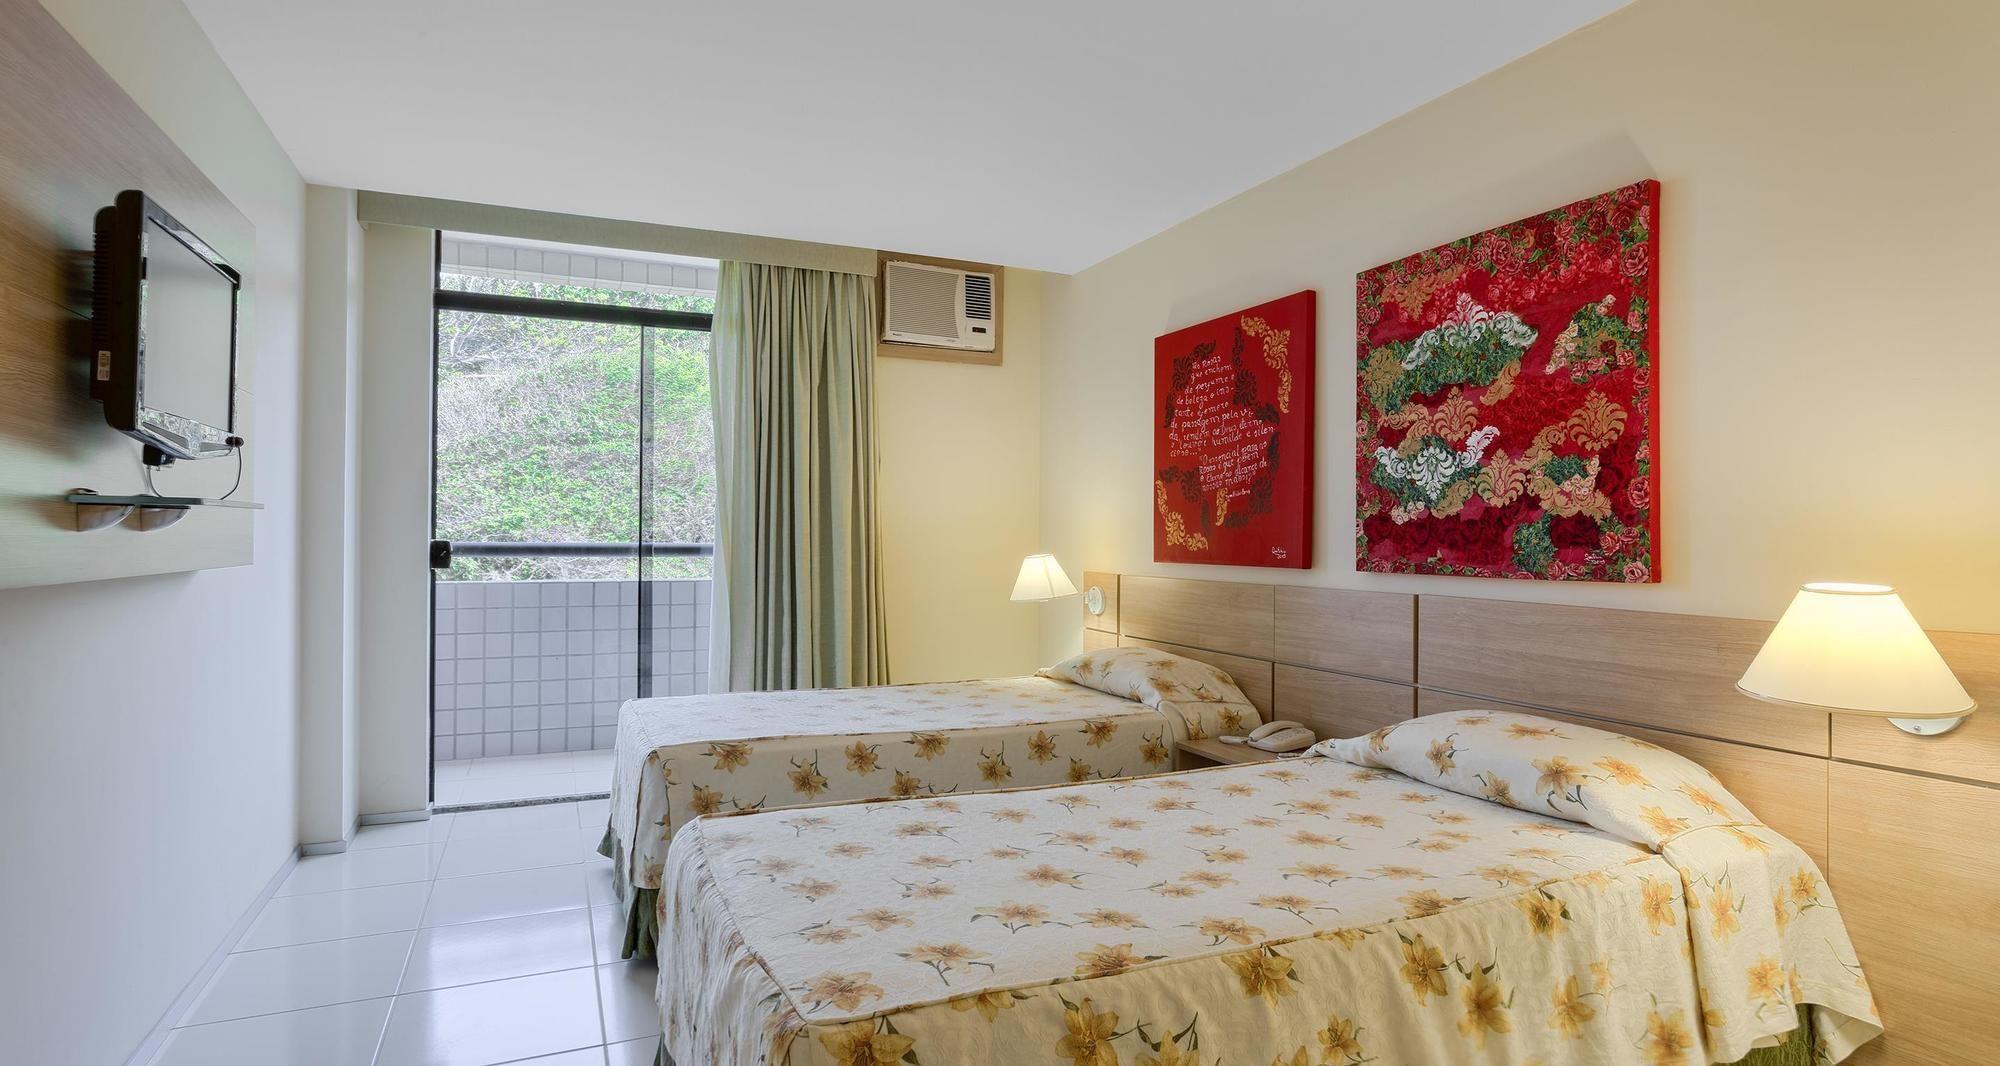 Gallery image of Praiabella Hotel